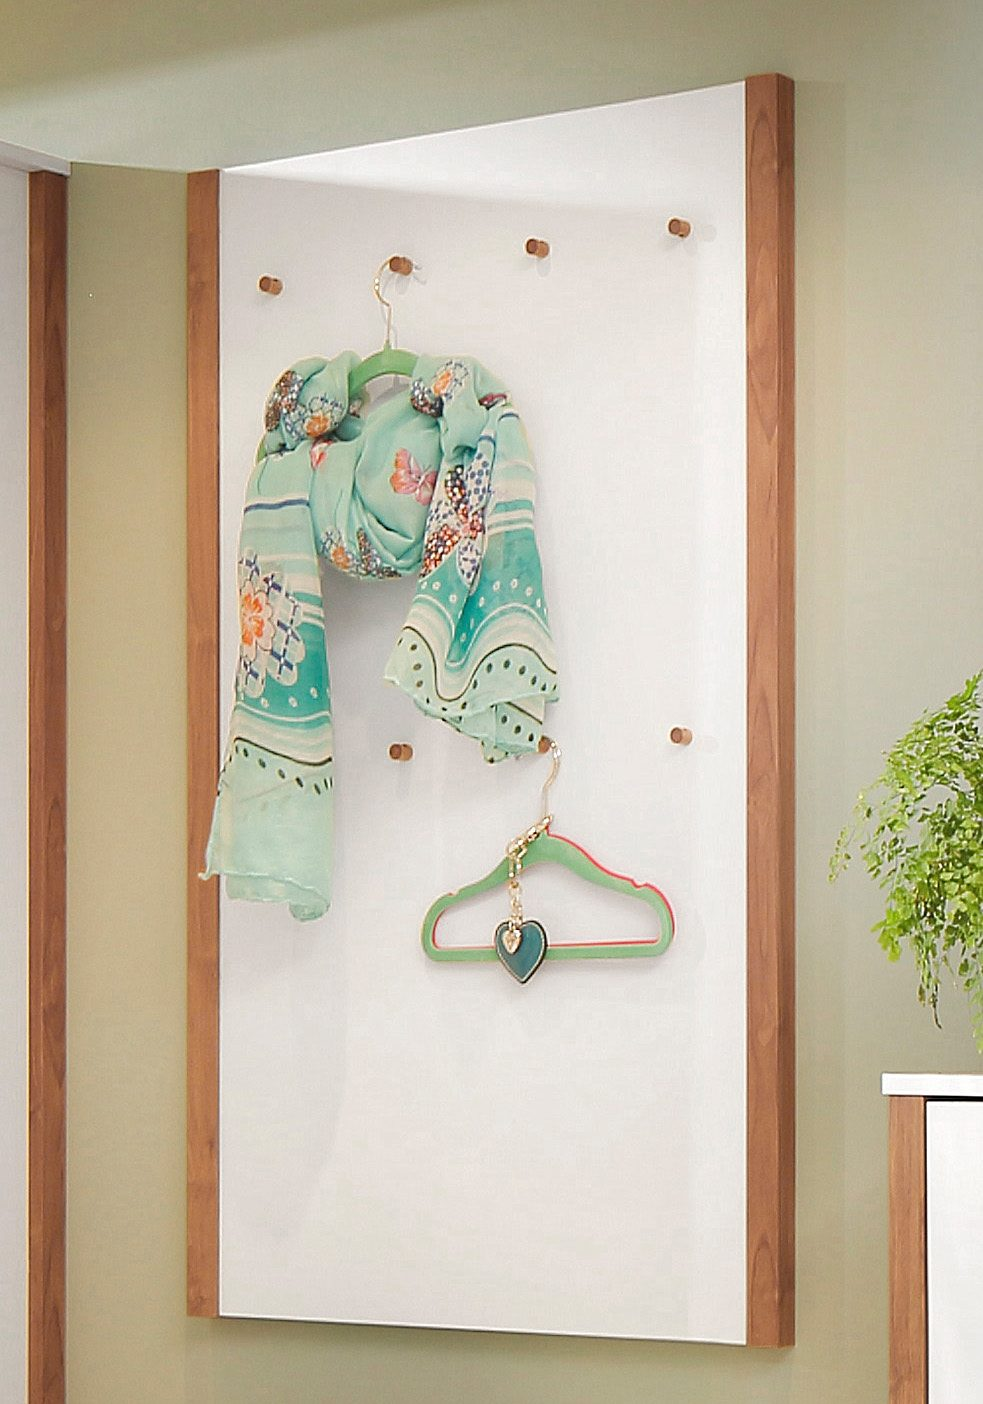 Home affaire Garderobenpaneel »Chic«